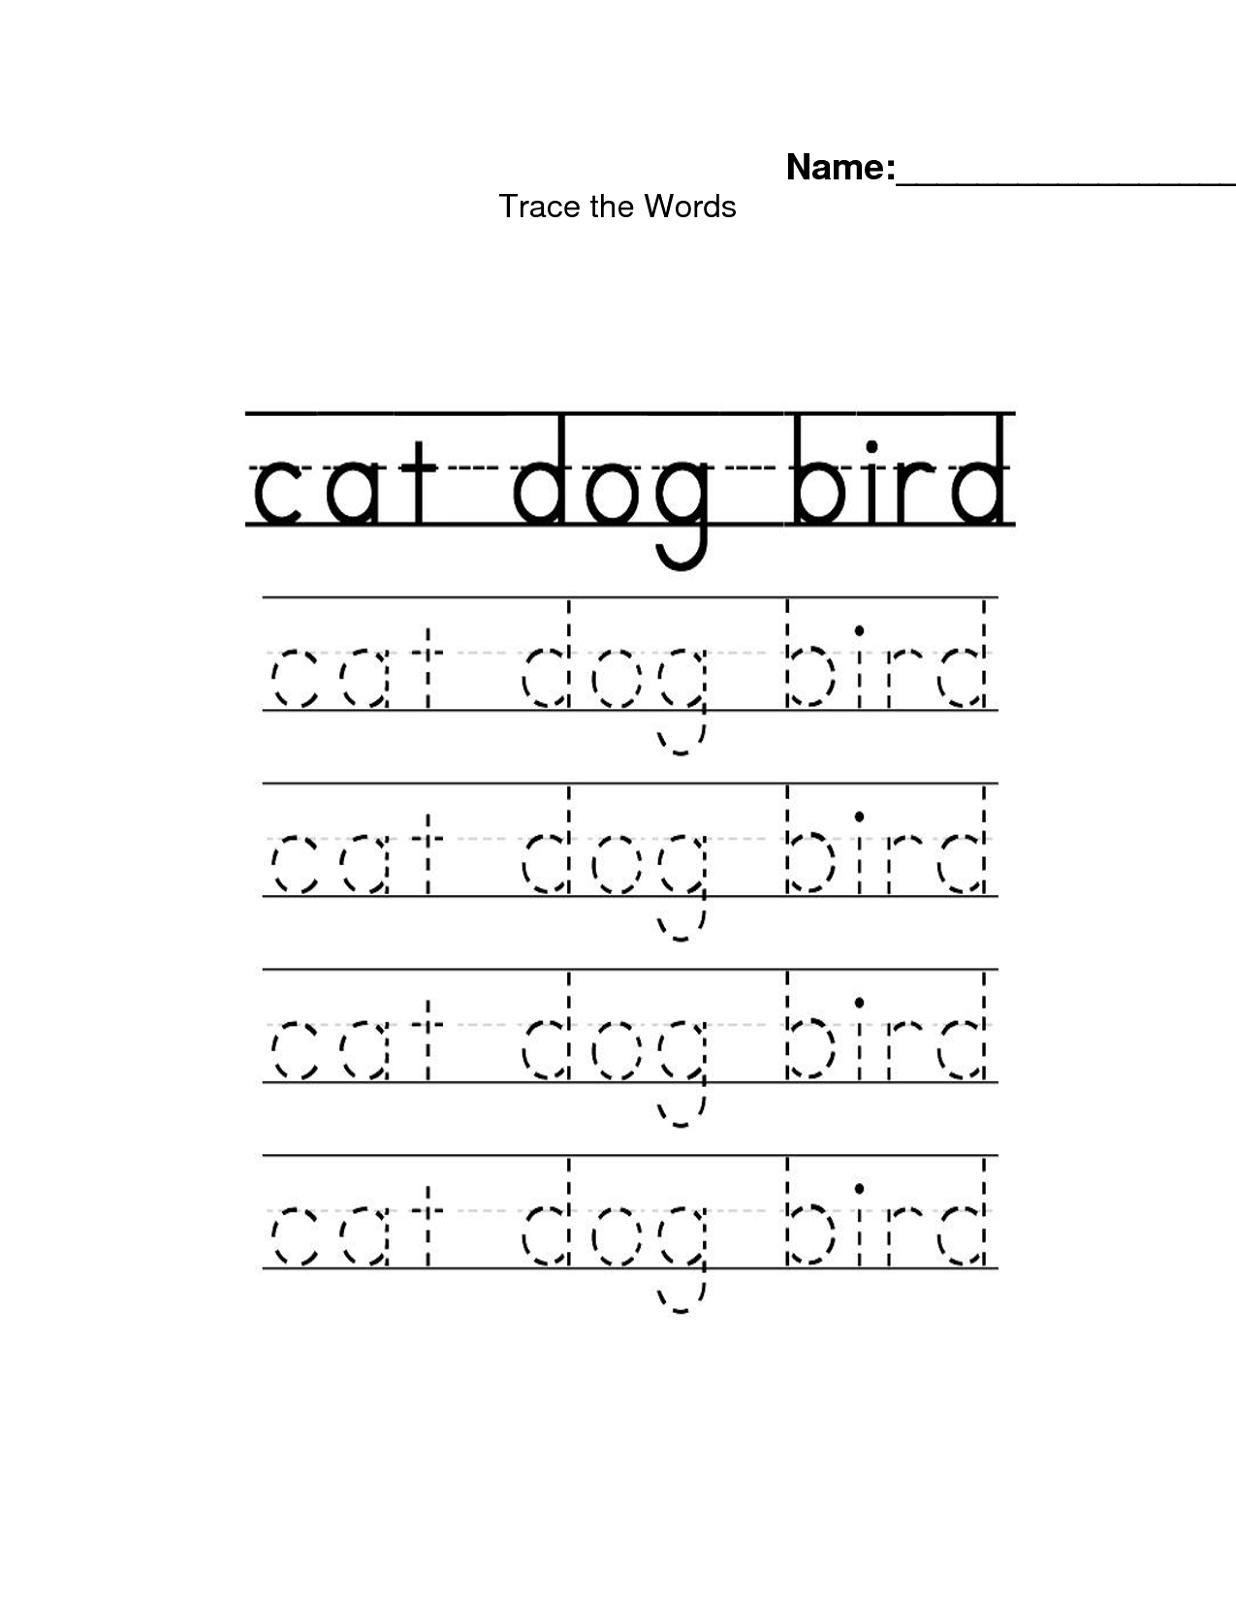 Worksheets Printable Name Tracing Worksheets name trace worksheet as writing devise kiddo shelter kids shelter